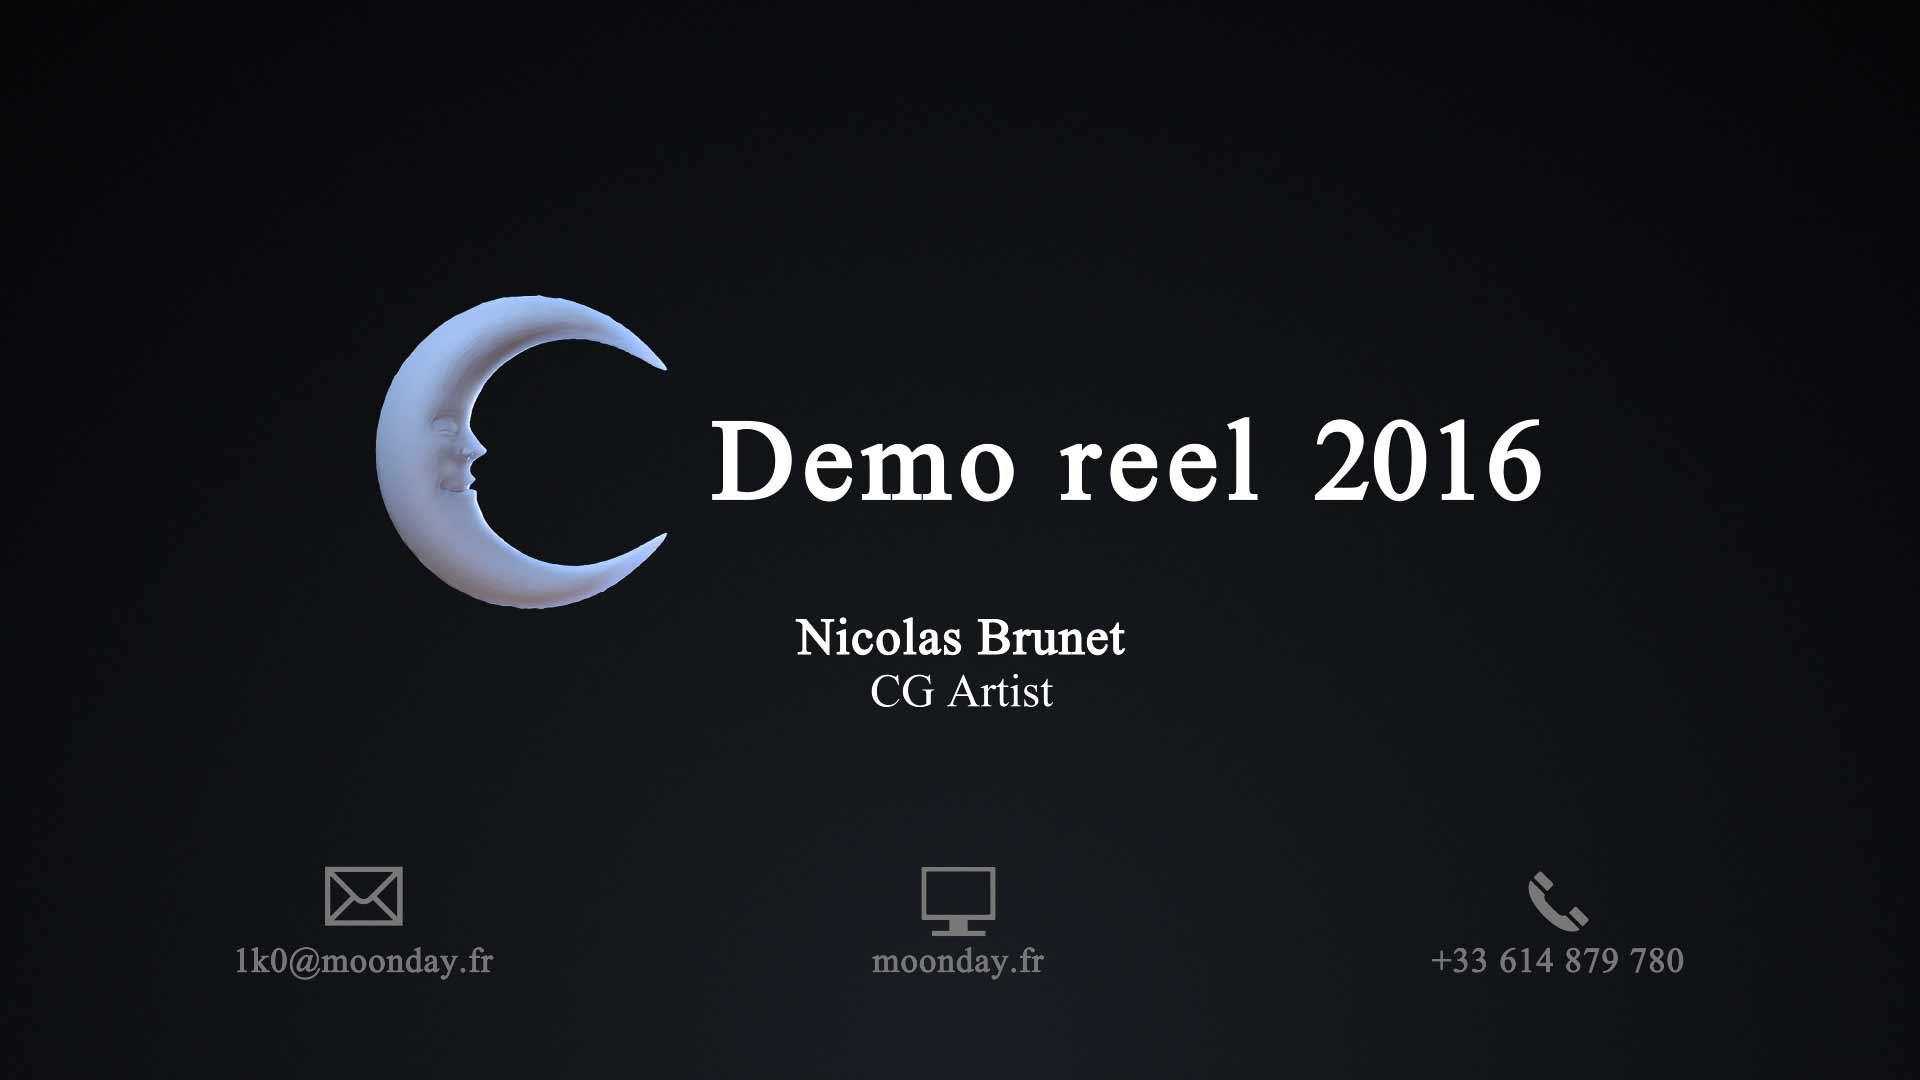 Demo reel – 2016